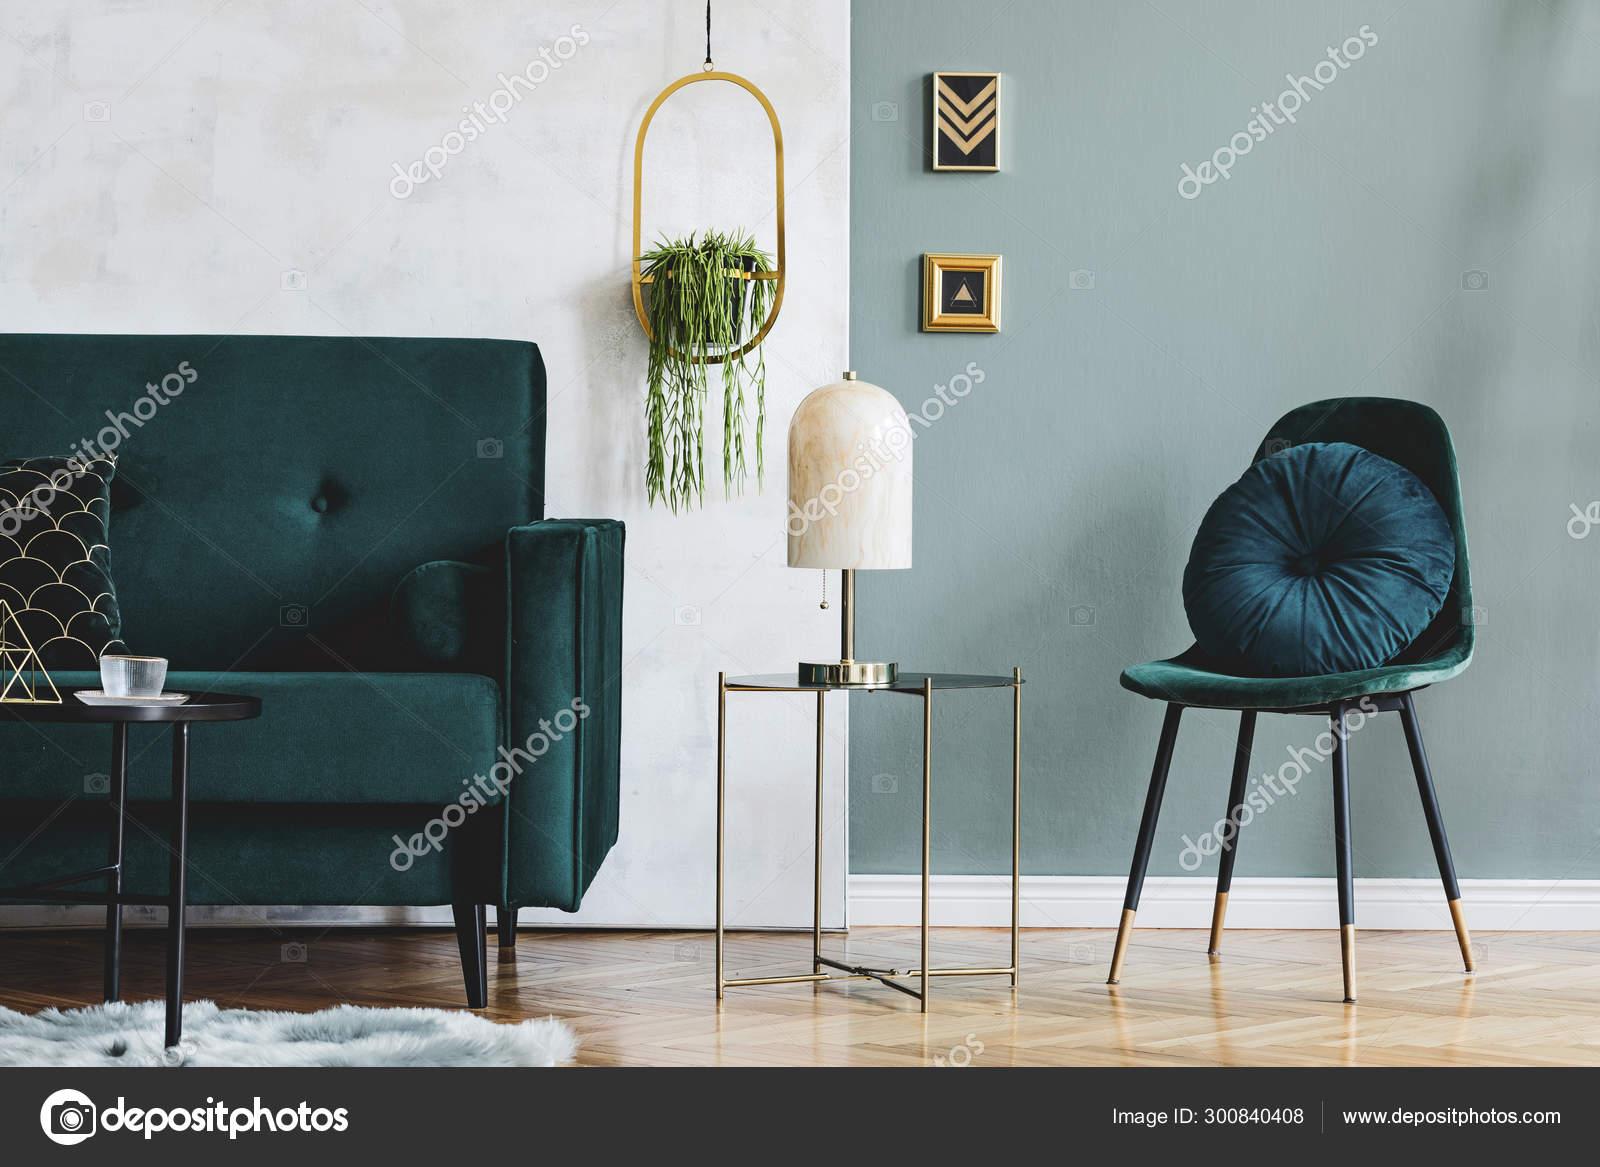 Stylish Luxury Interior Design Living Room Green Velvet Sofa Design Stock Photo C Followtheflow 300840408